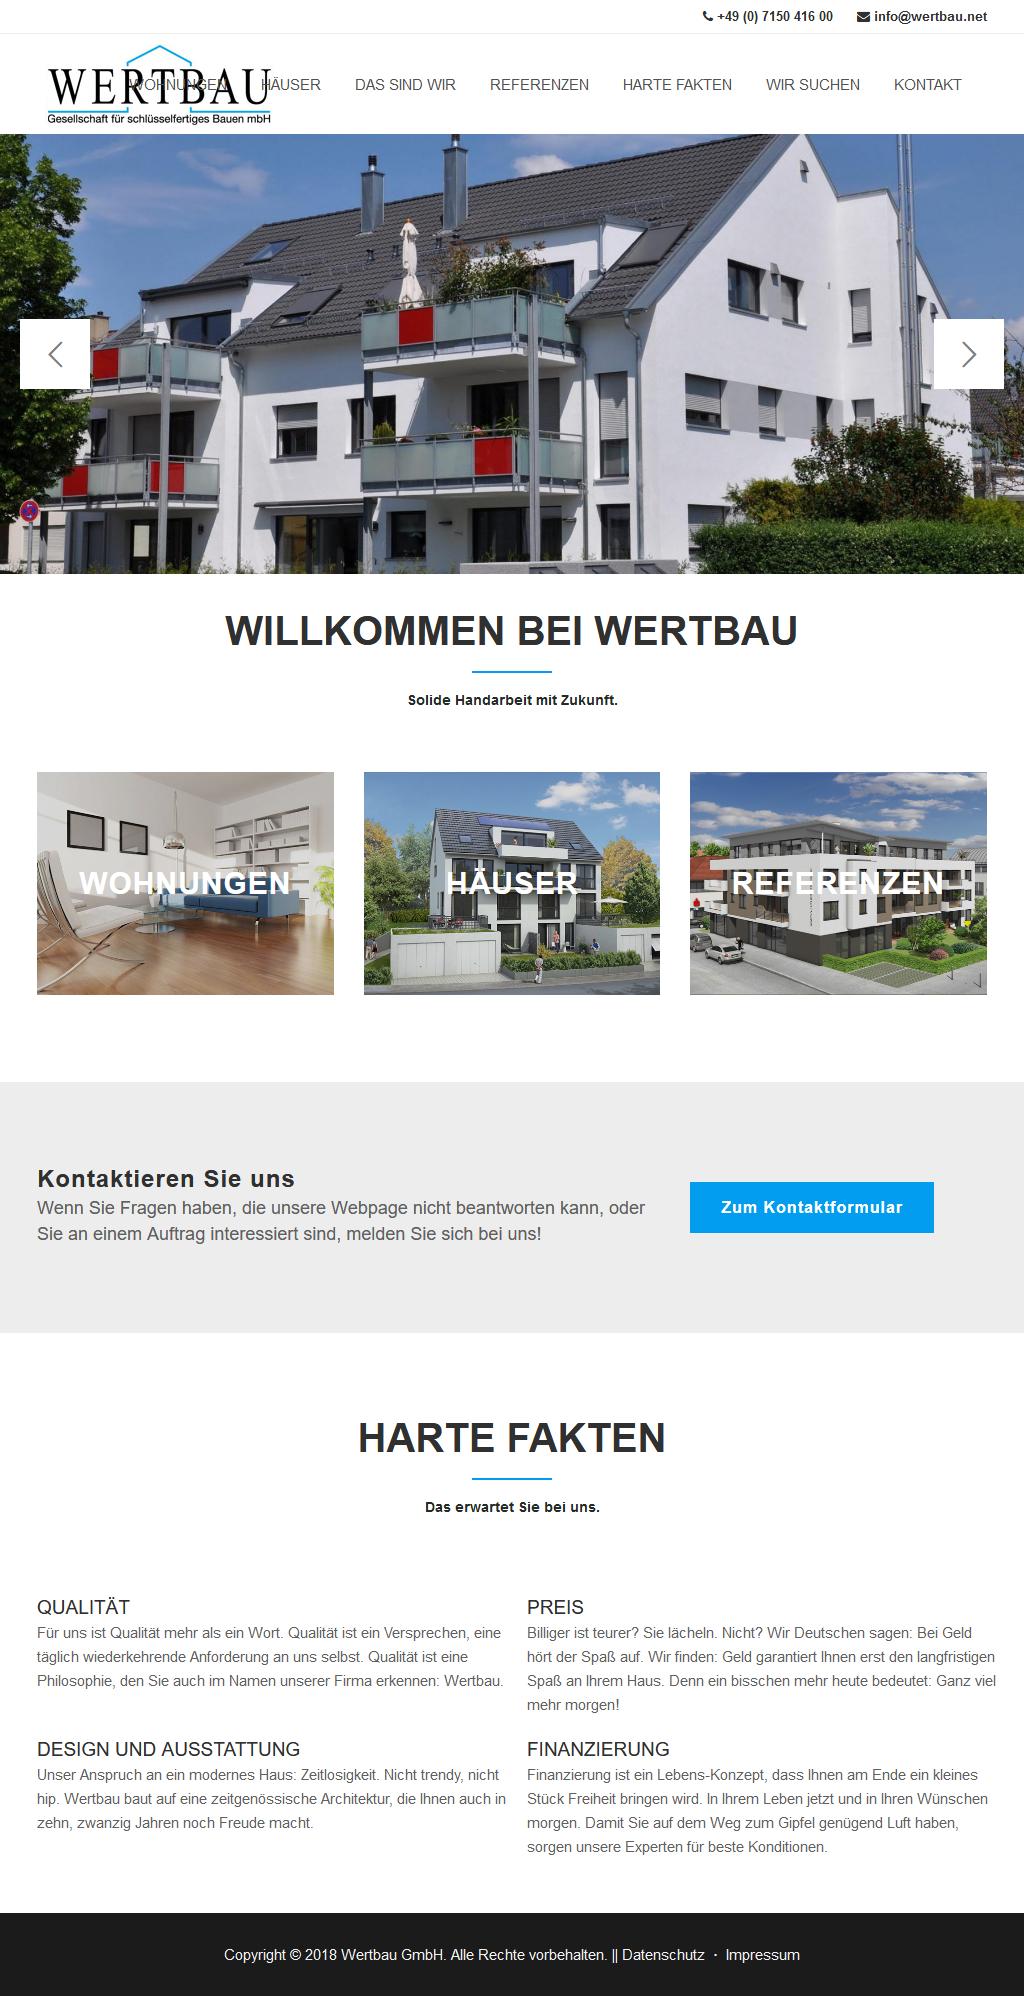 Makler-Wohnbaugesellschaft Webdesign -Tablet